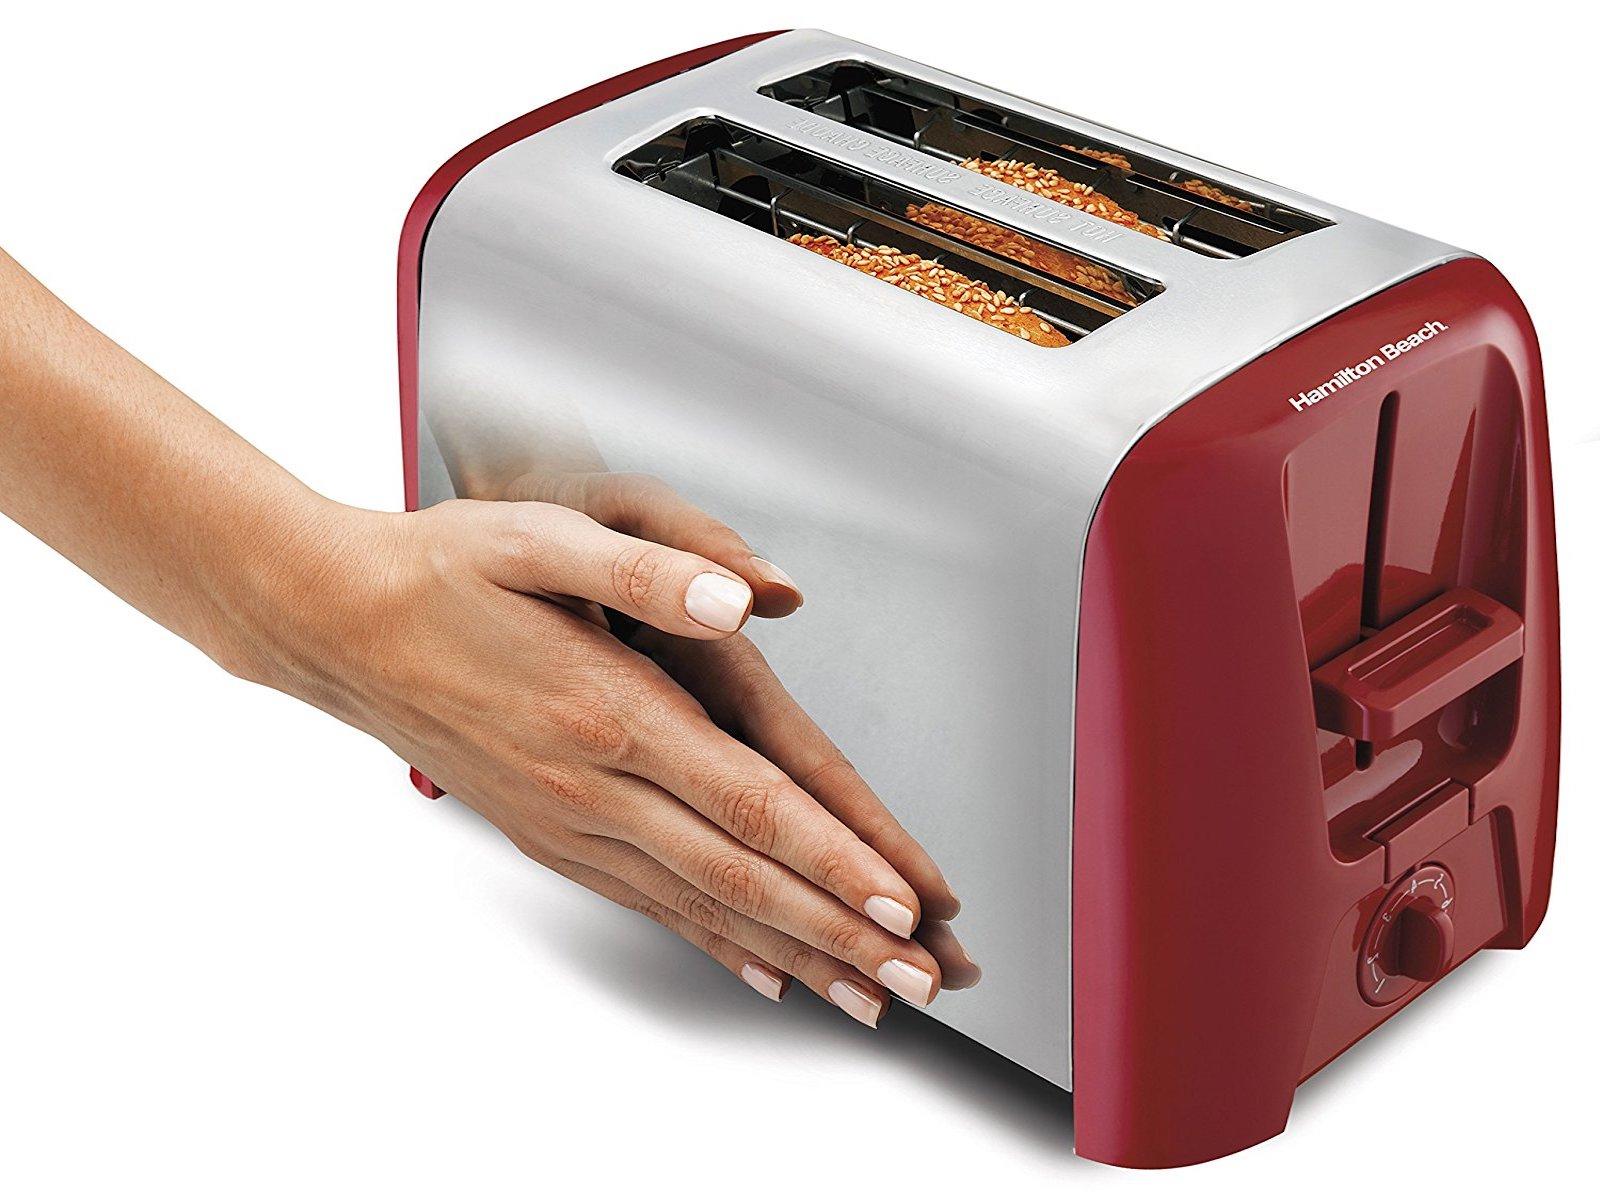 hamilton beach toaster over